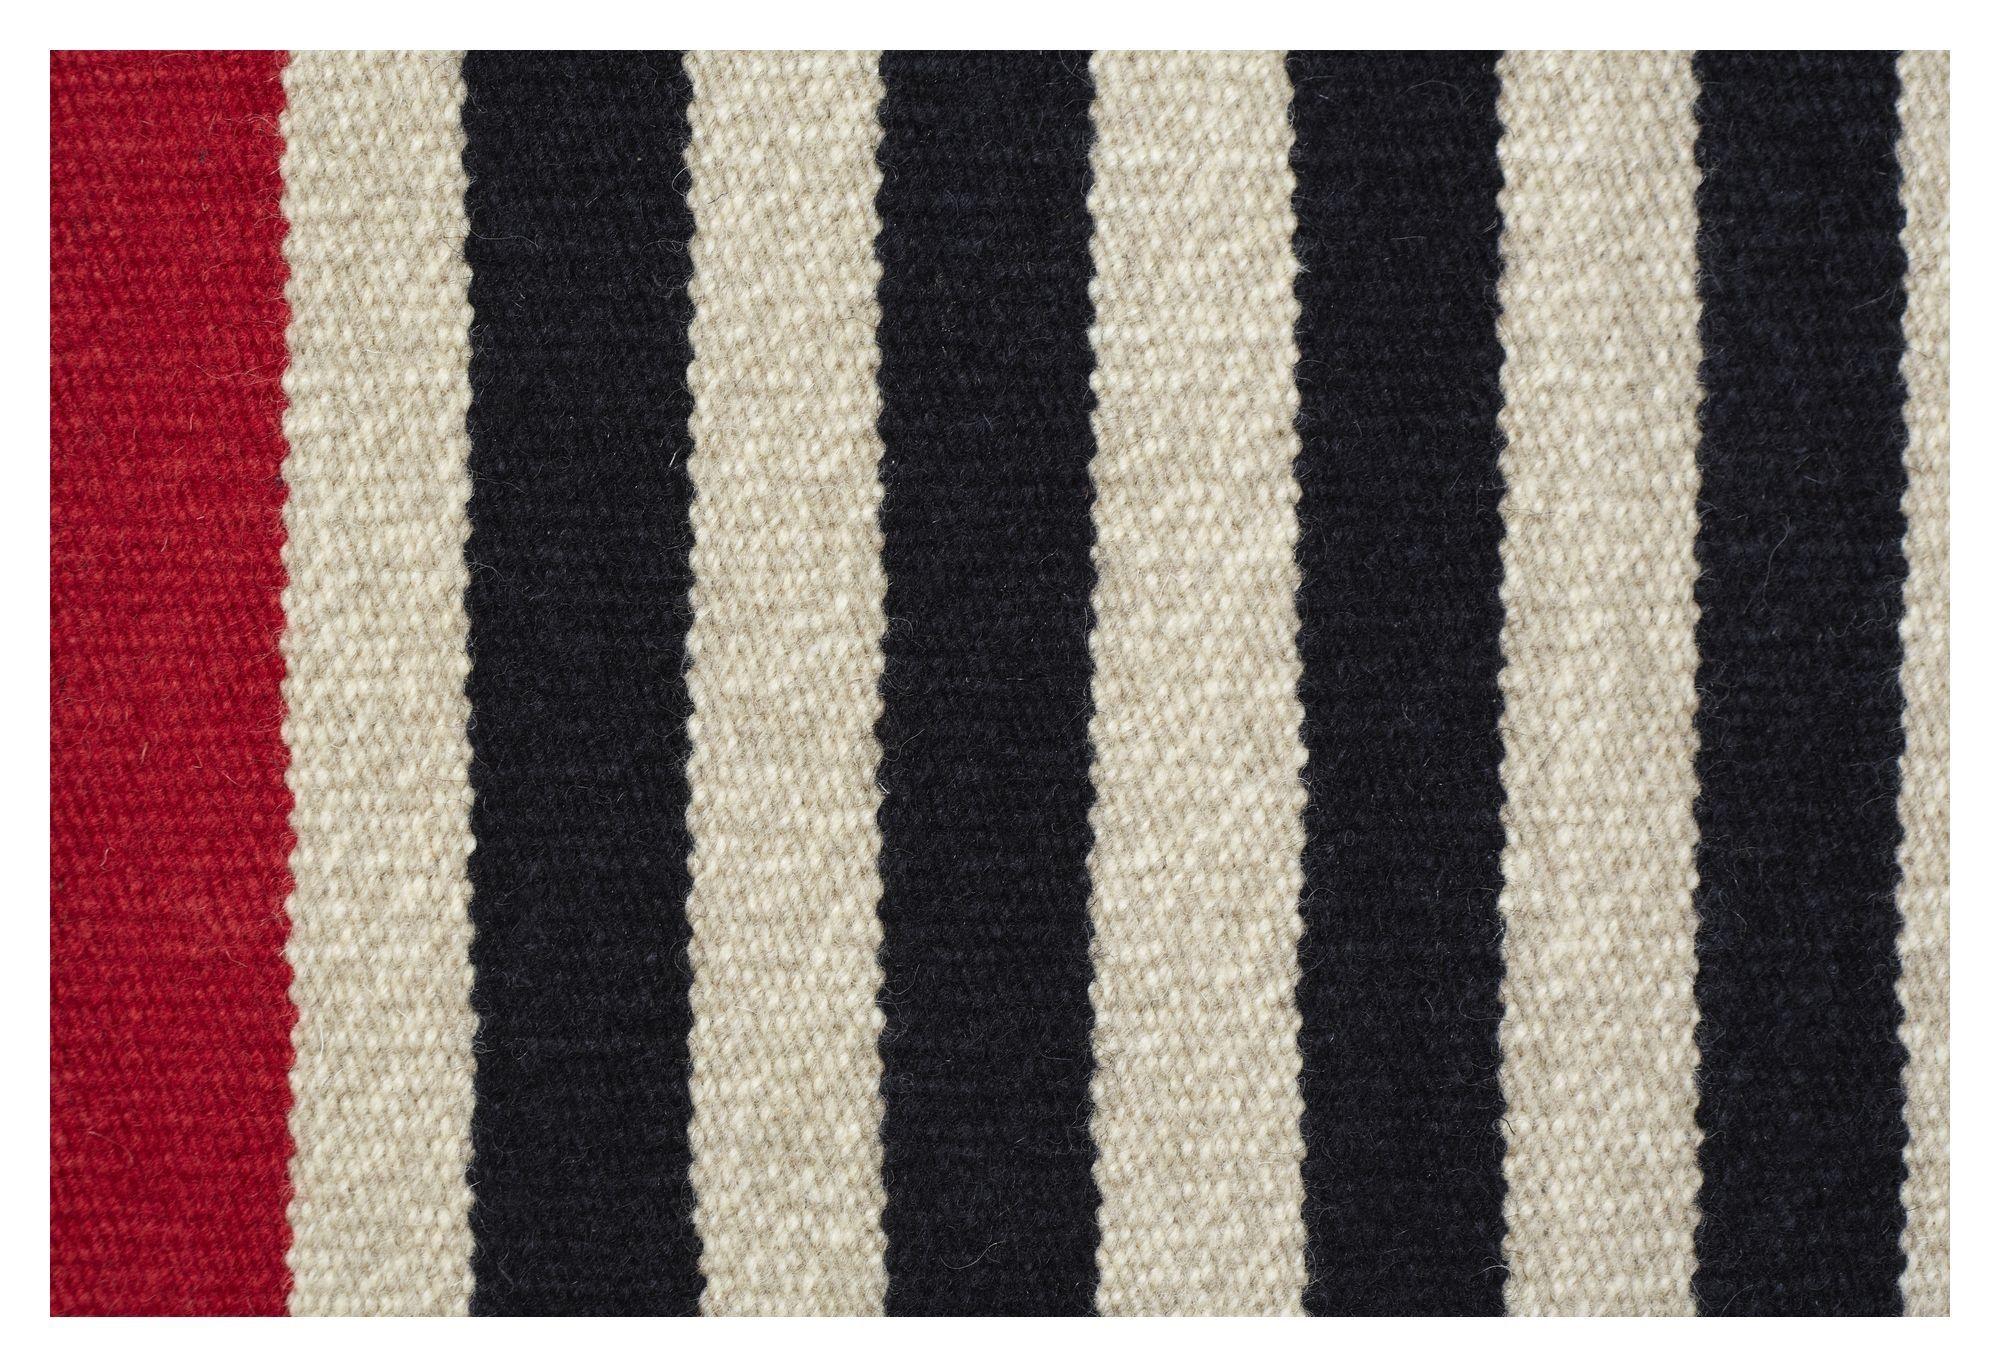 Fabula Rosemary tæppe - Sort/Beige - Håndvævet Kelim 170x240 cm